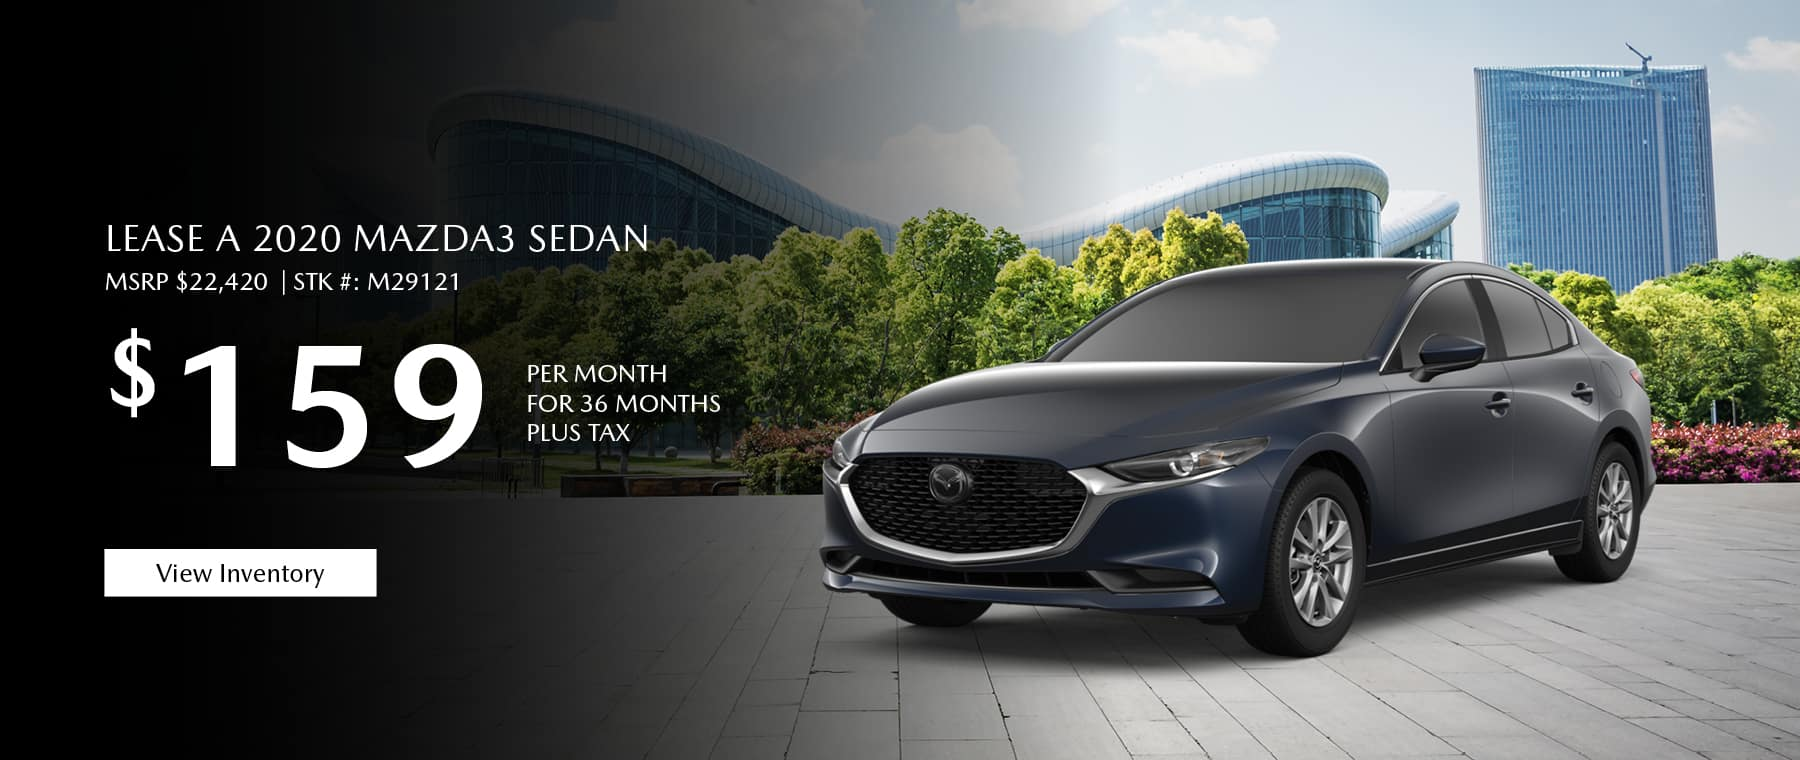 Lease the 2020 Mazda3 sedan for $159 per month, plus tax.